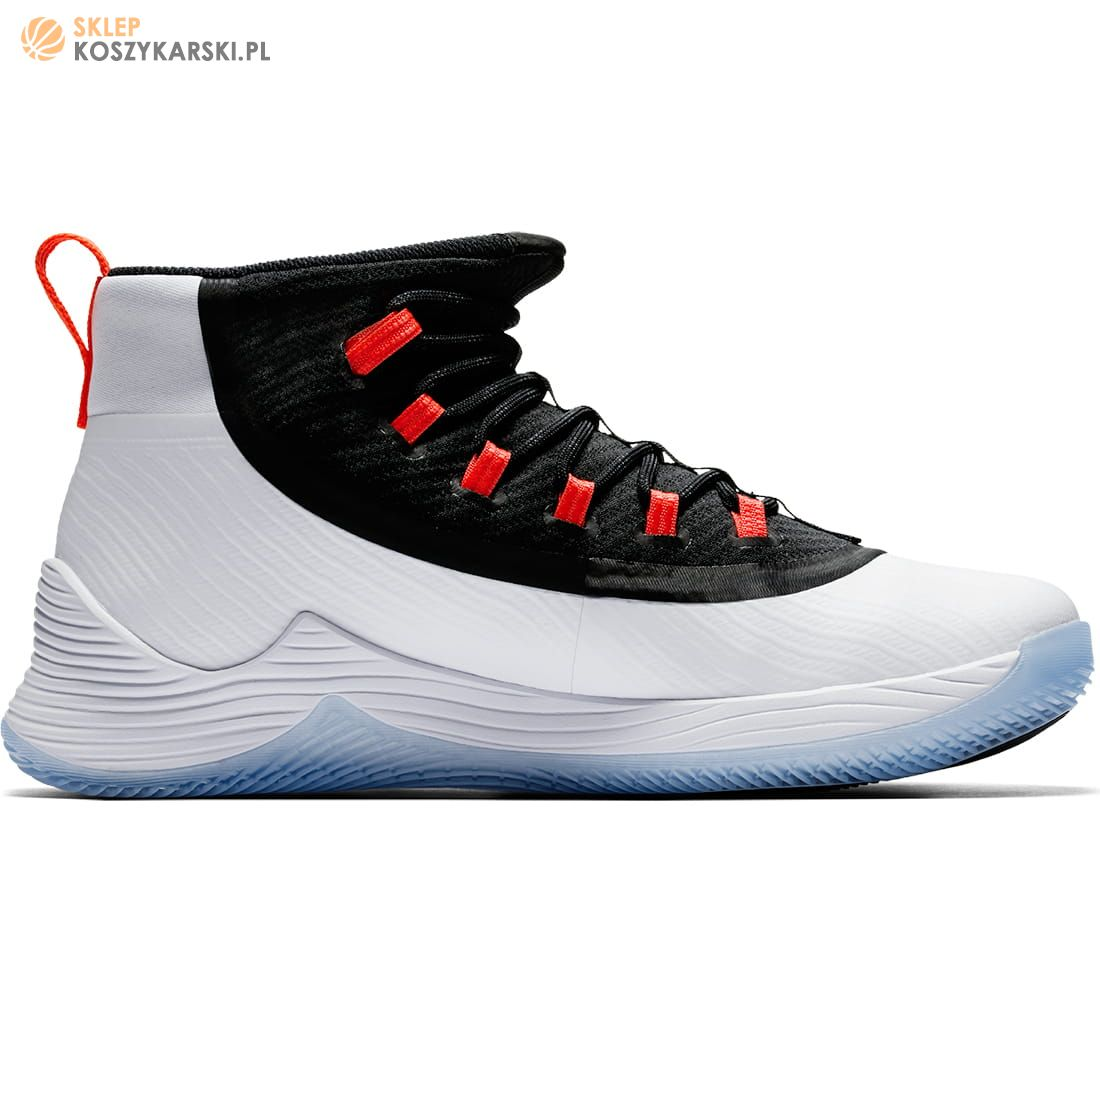 Buty Do Koszykowki Jordan Ultra Fly 2 897998 123 Sklepkoszykarski Pl